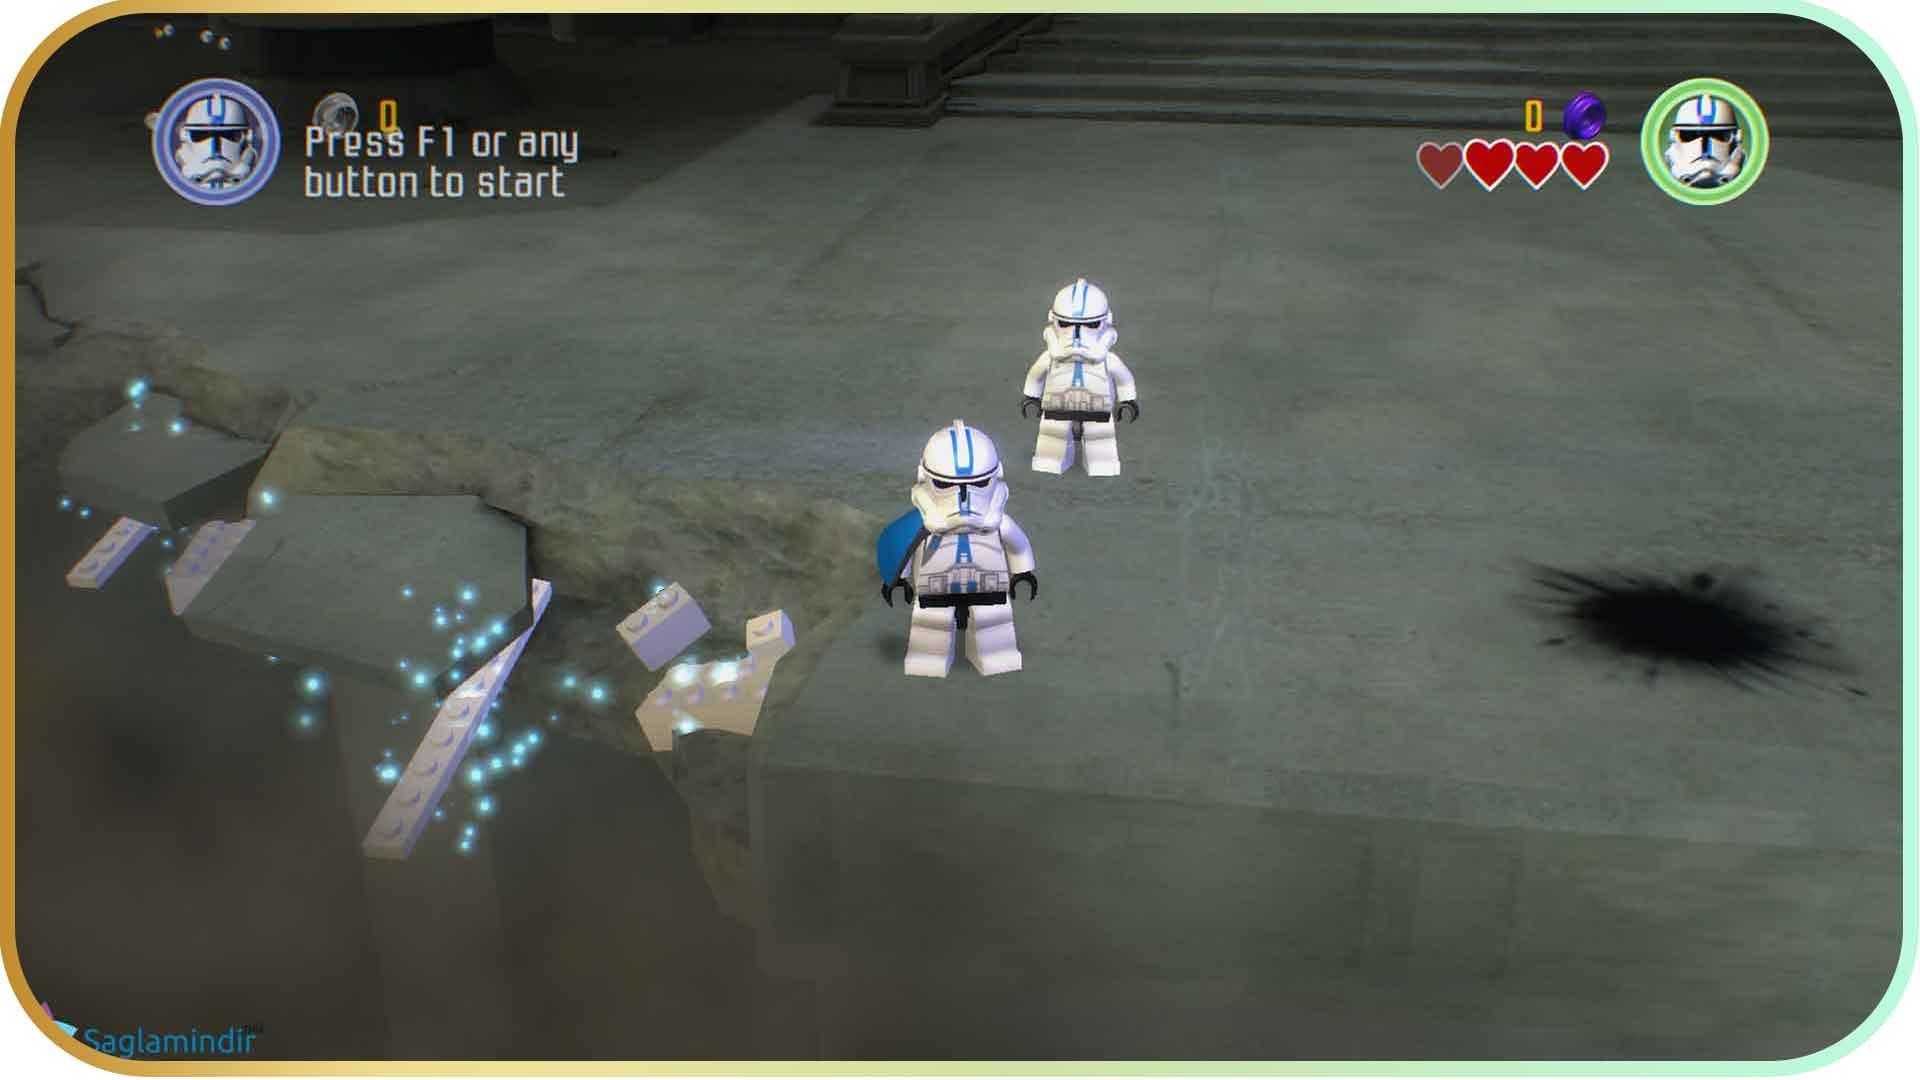 Lego Star Wars The Complete Saga saglamindir